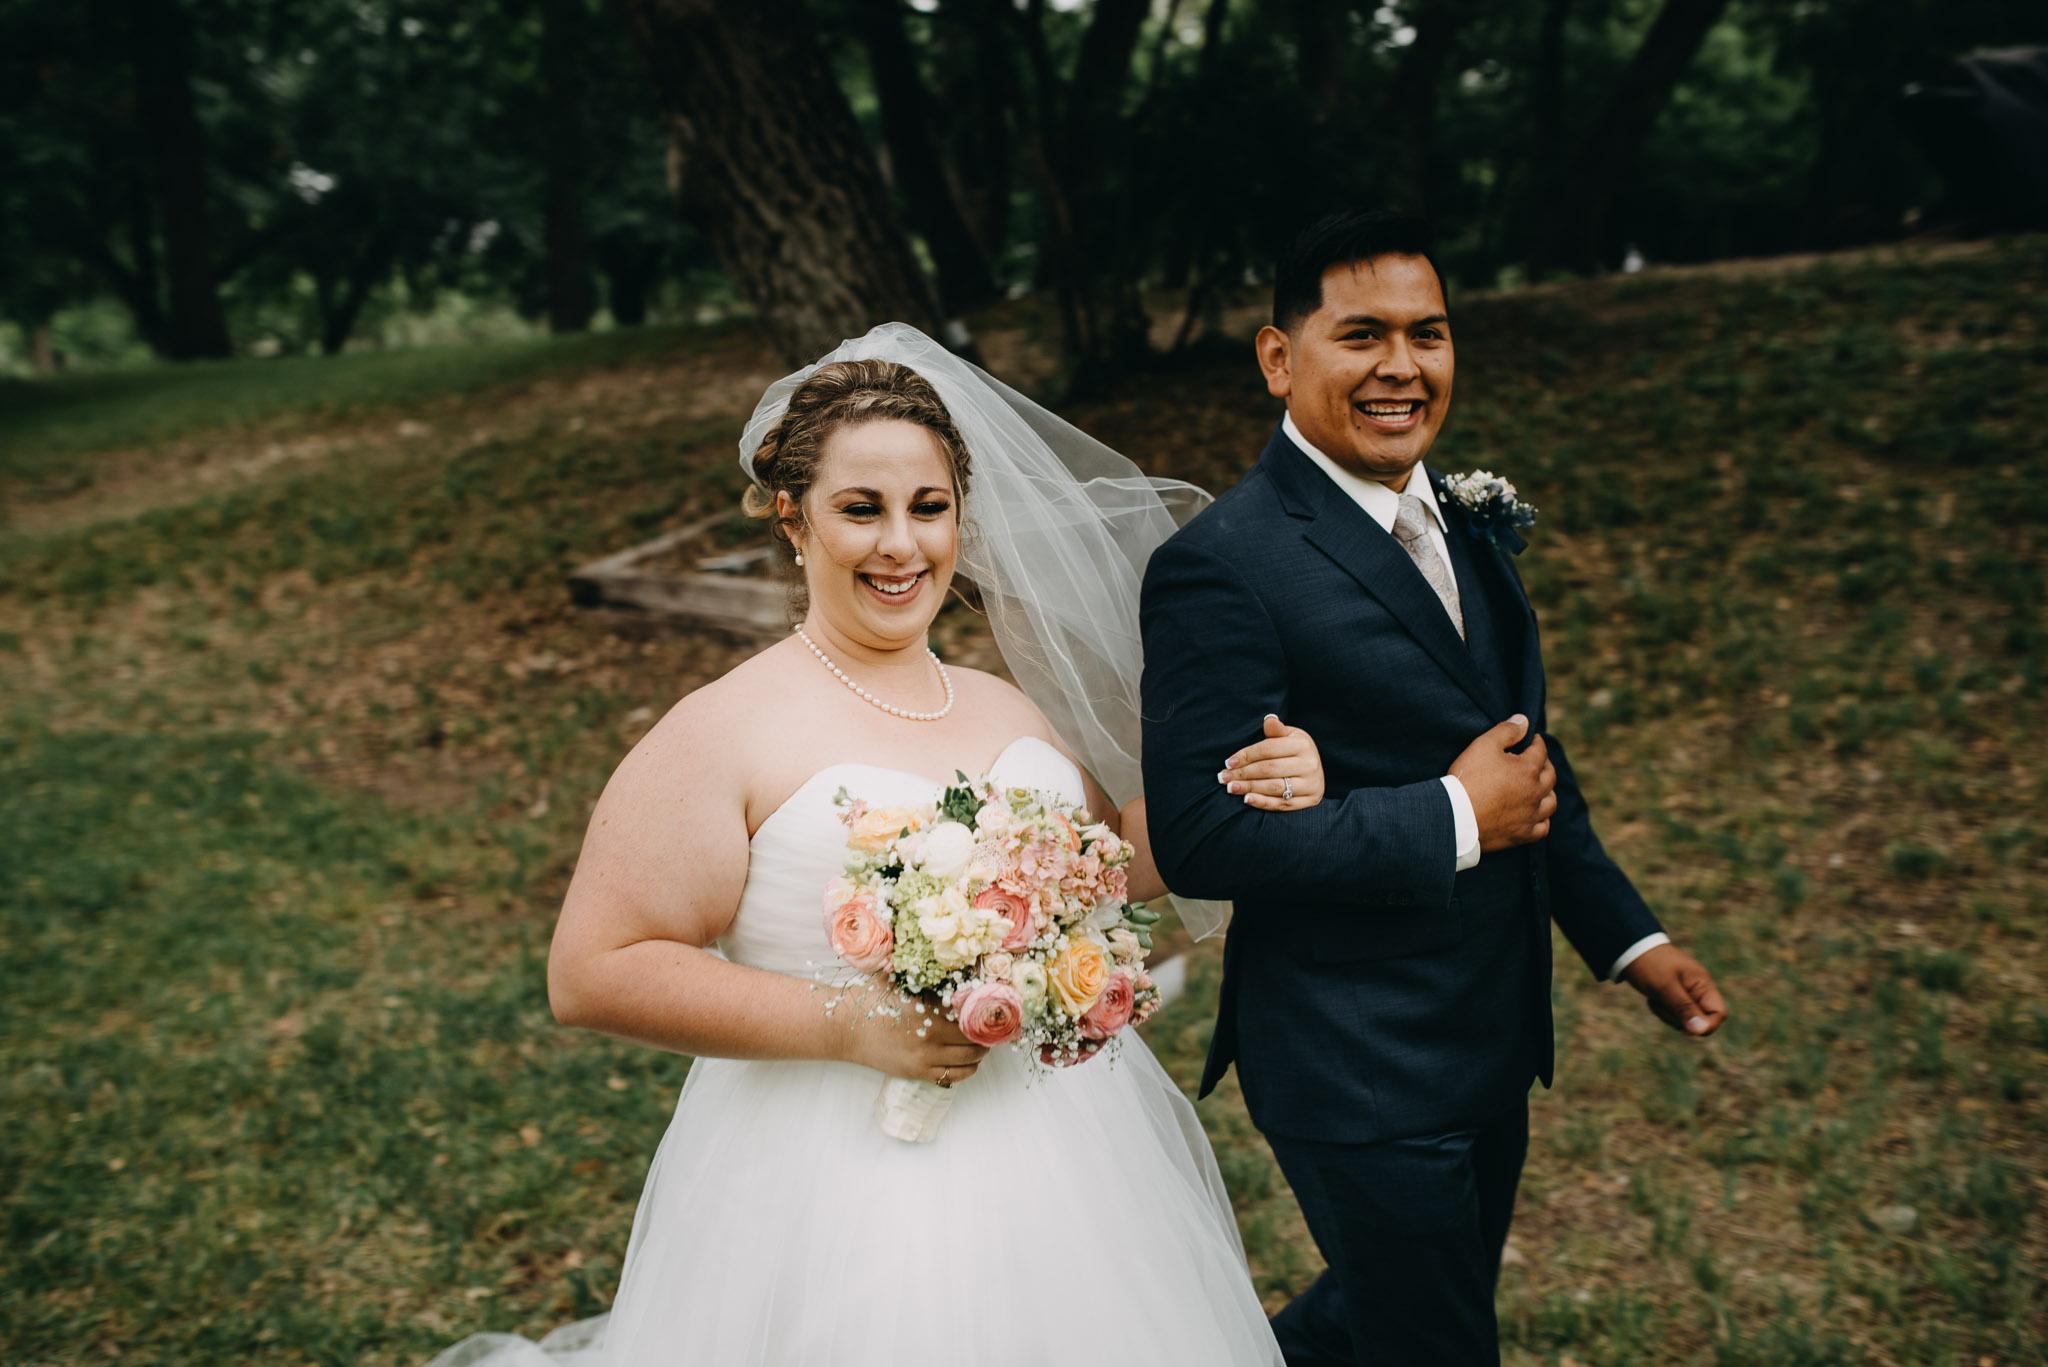 Christoval-Texas-Wedding_Photographer-Meghan&Tony-0020.jpg